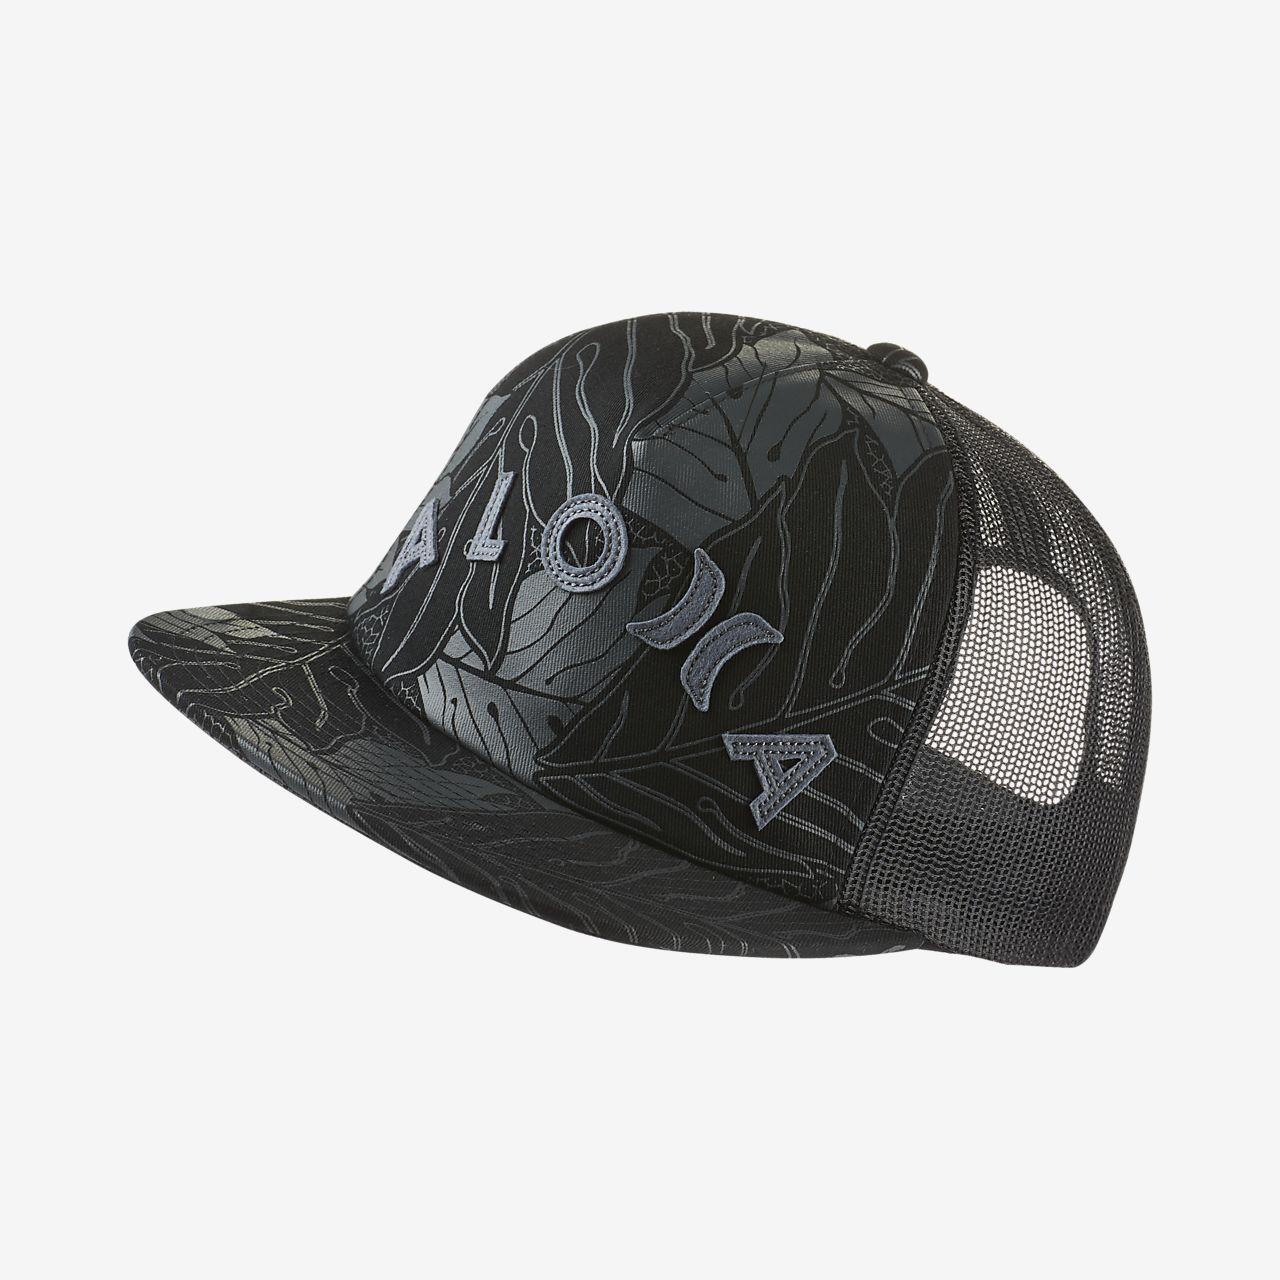 Gorra para hombre Hurley Sig Zane Ululoa. Nike.com MX 81655deef34